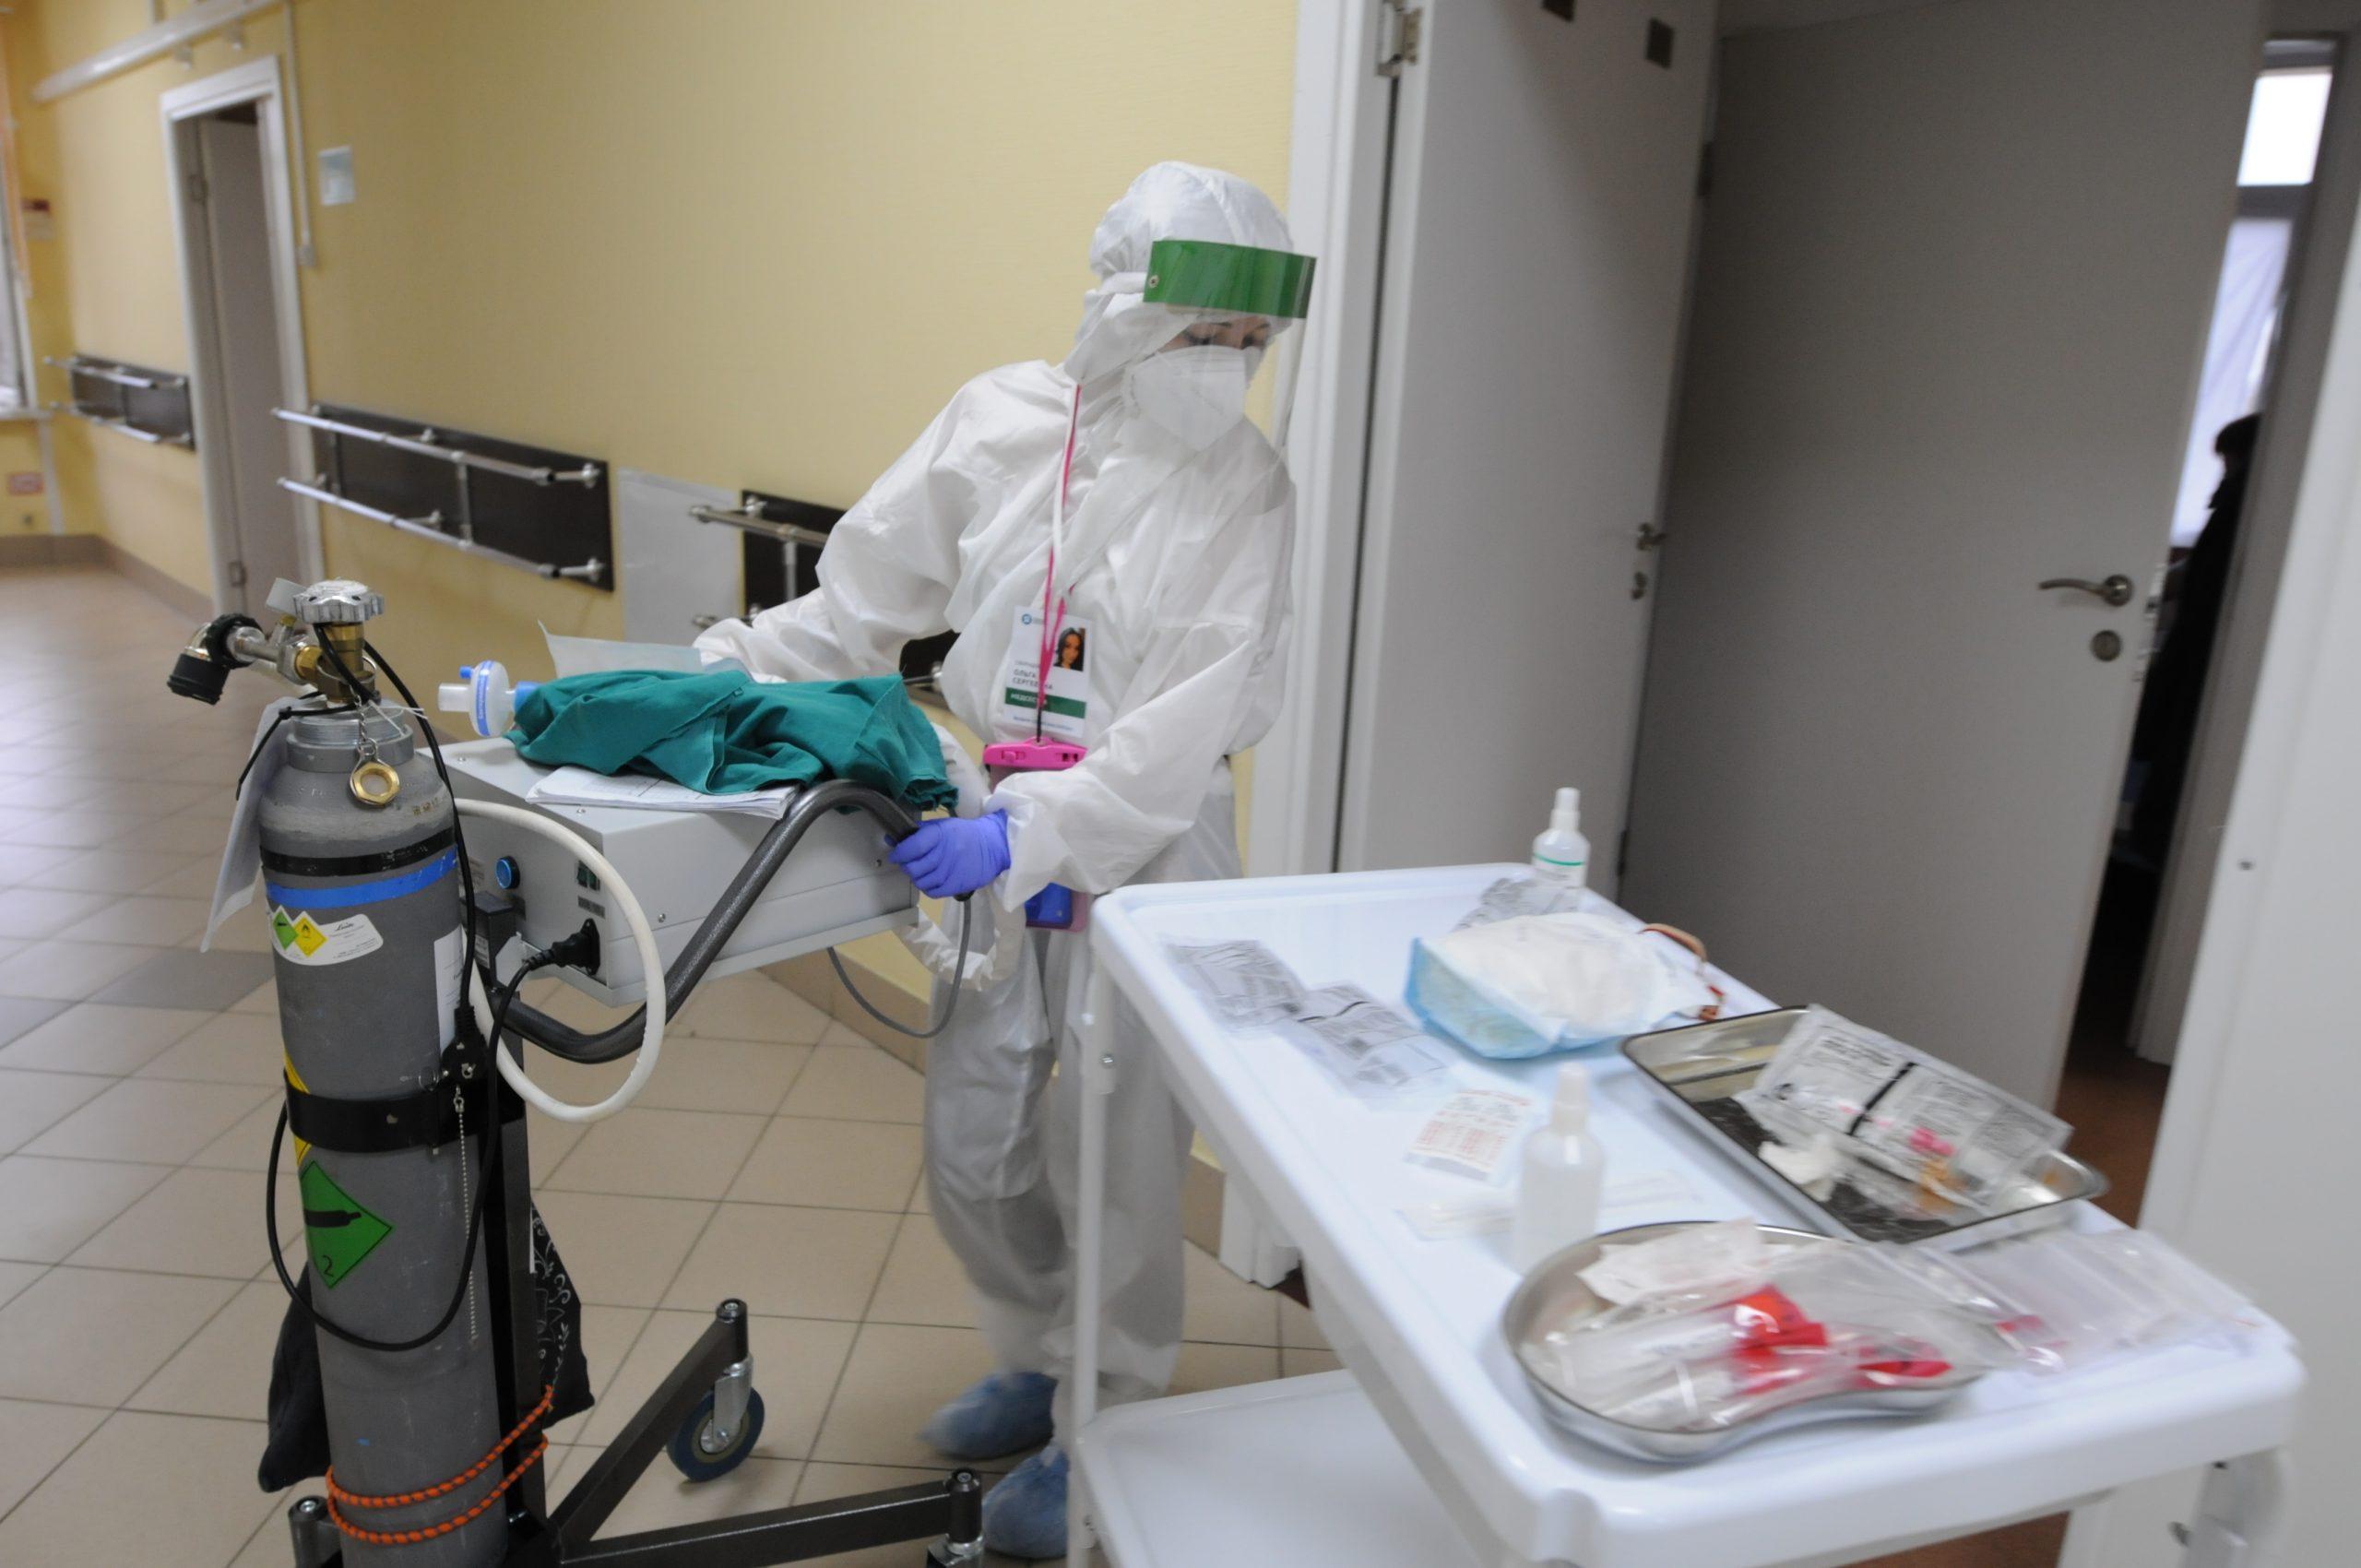 Сотрудники Оперативного штаба рассказали о заболевших коронавирусом в столице за последние сутки